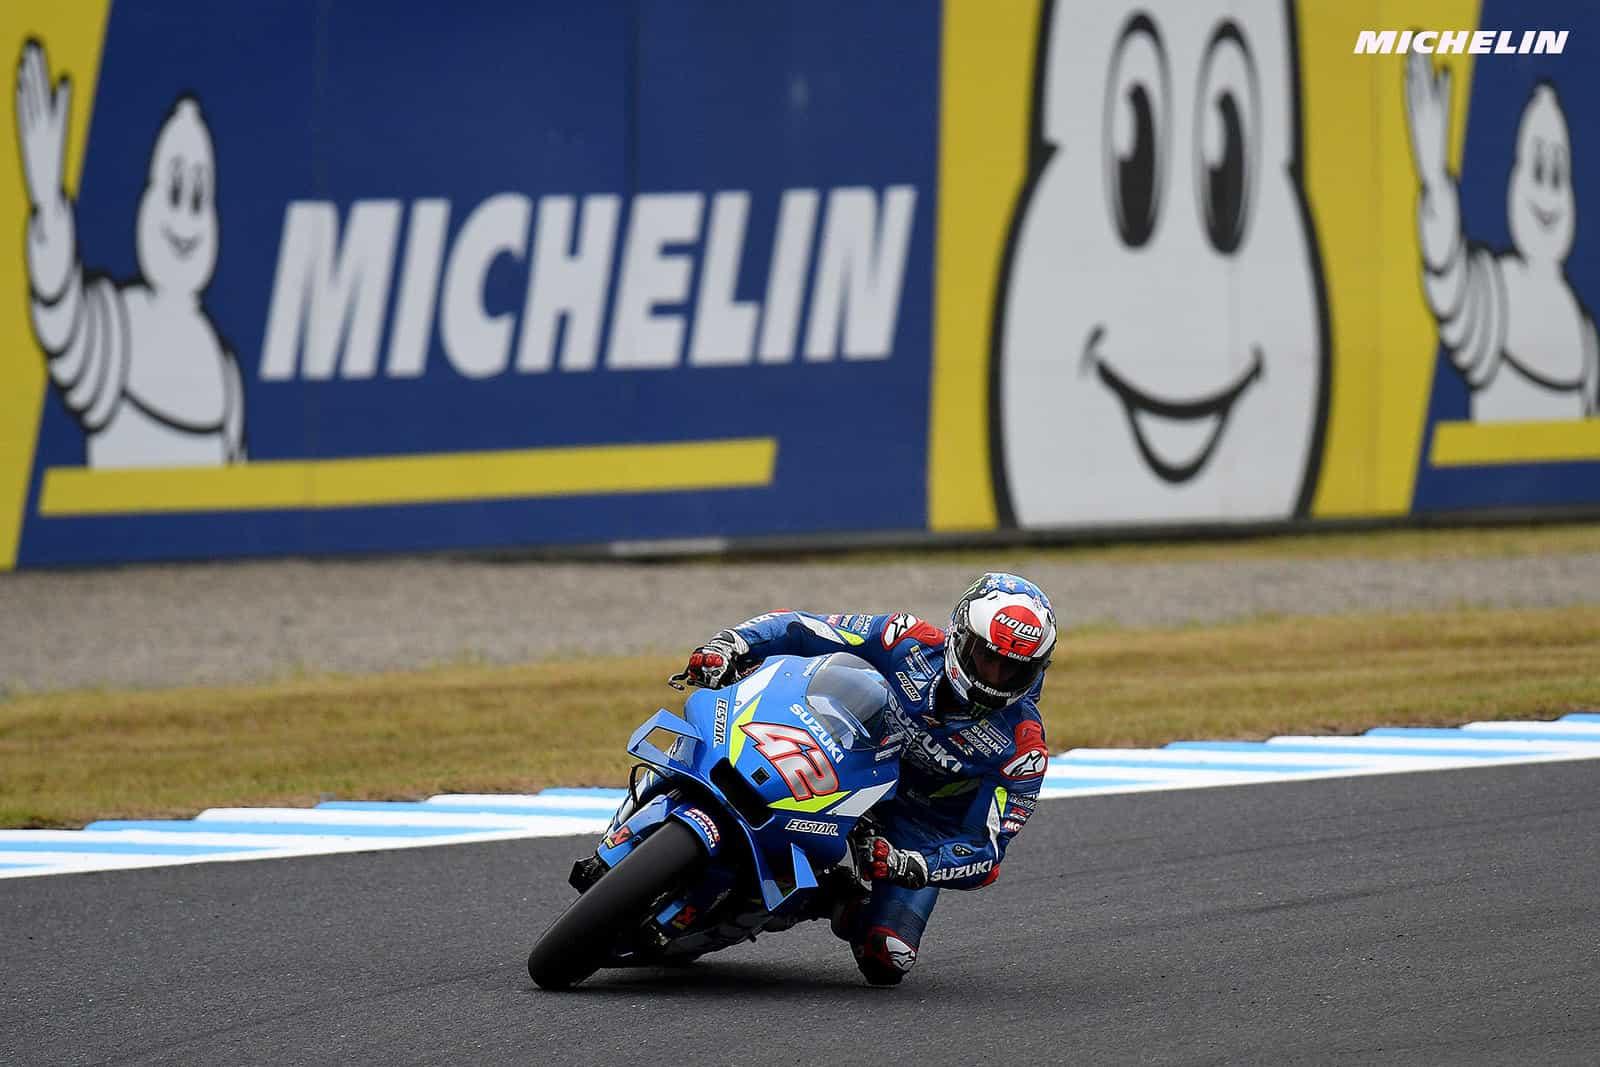 MotoGP2019オーストラリアGP リンス「スタートからコンディションに気を使う必要がある」